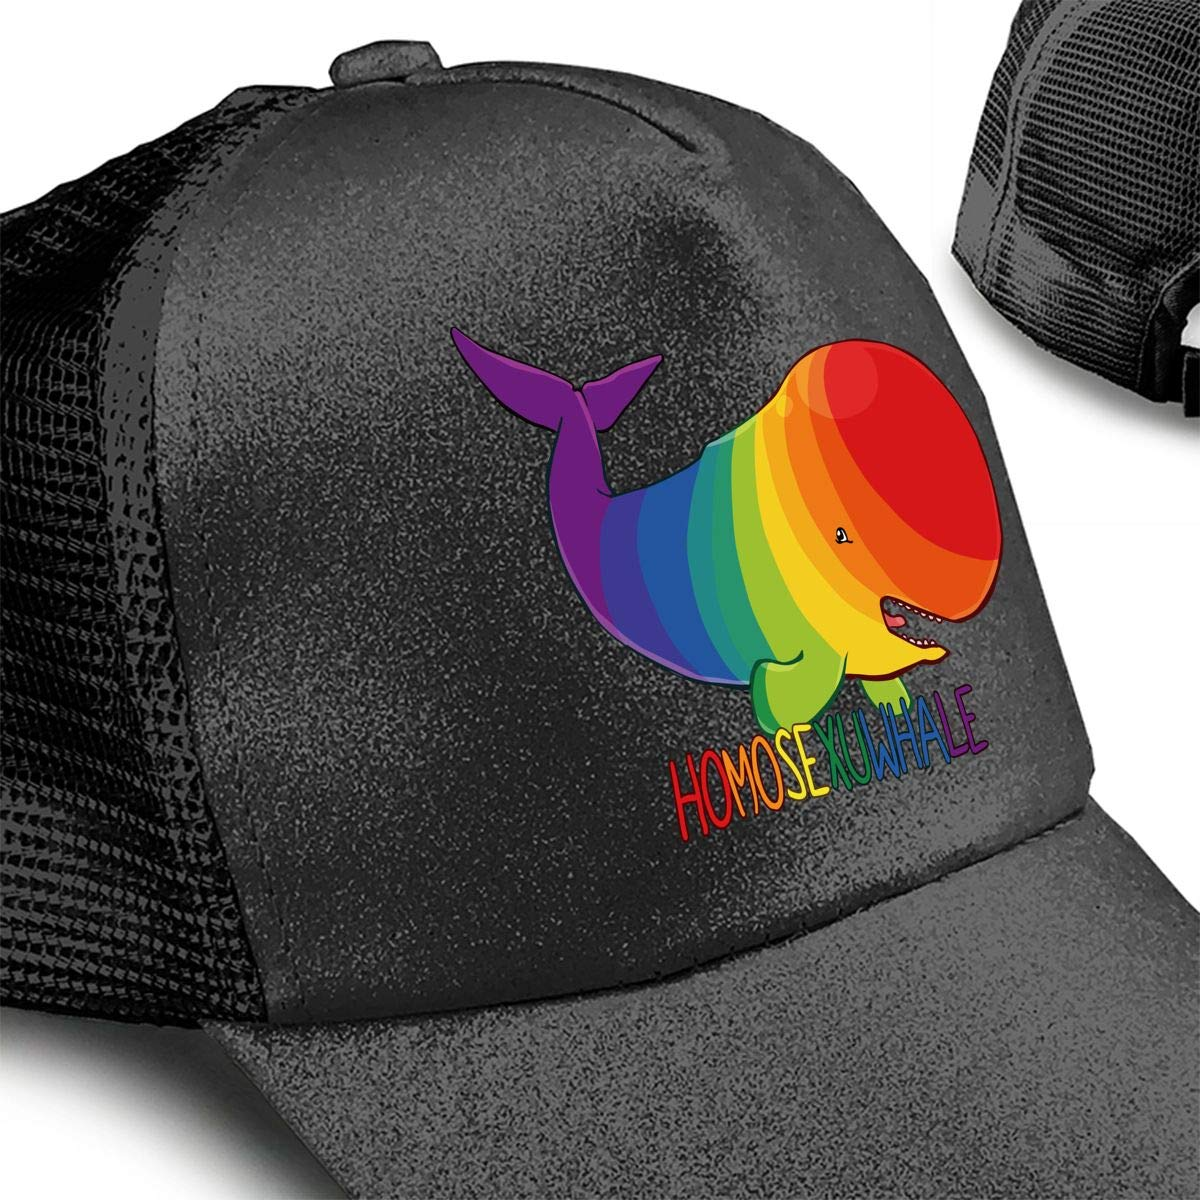 Colorful Whale Ponytail Messy High Bun Hat Ponycaps Baseball Cap Adjustable Trucker Cap Mesh Cap